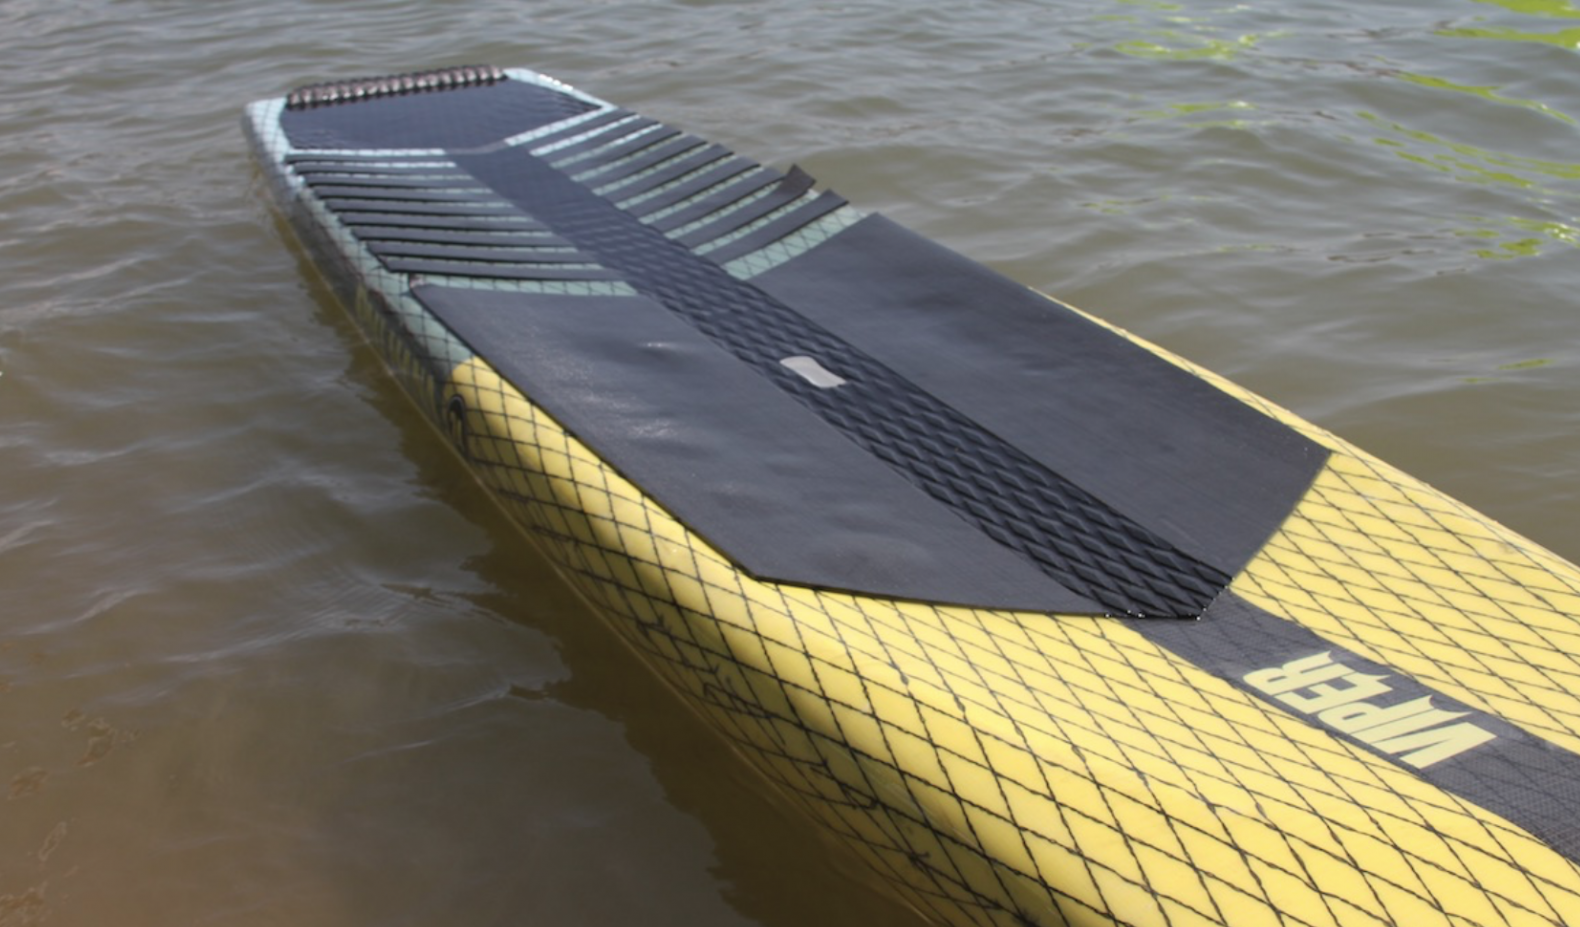 Viper pau hana paddle board on the water